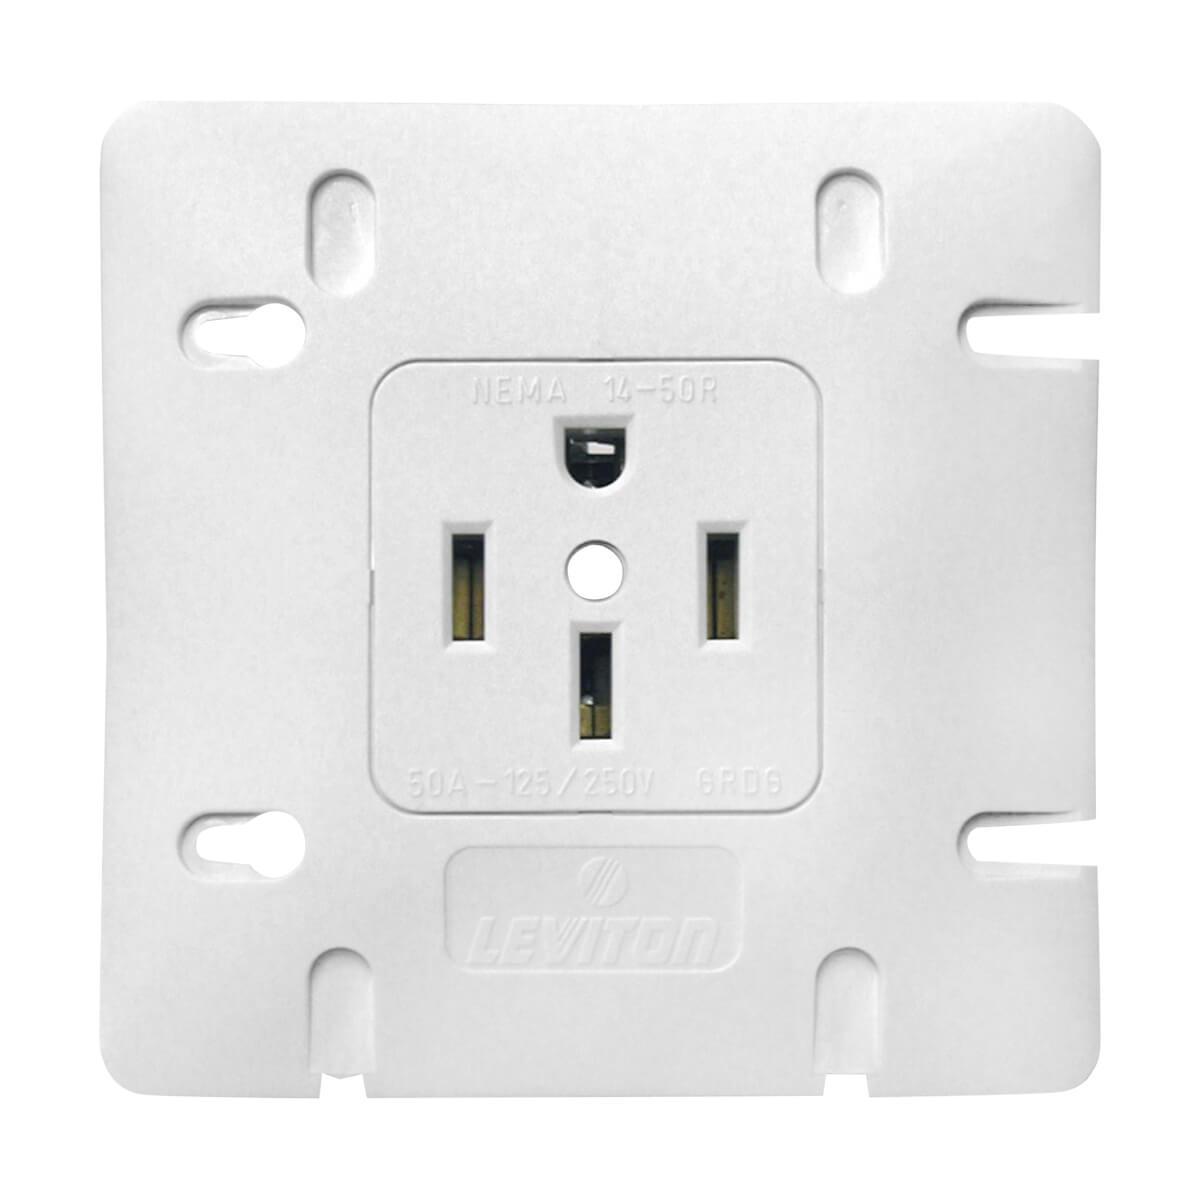 Stove Receptacle - 50 A - 125/250 V - Plastic - White - 1168-2-SP